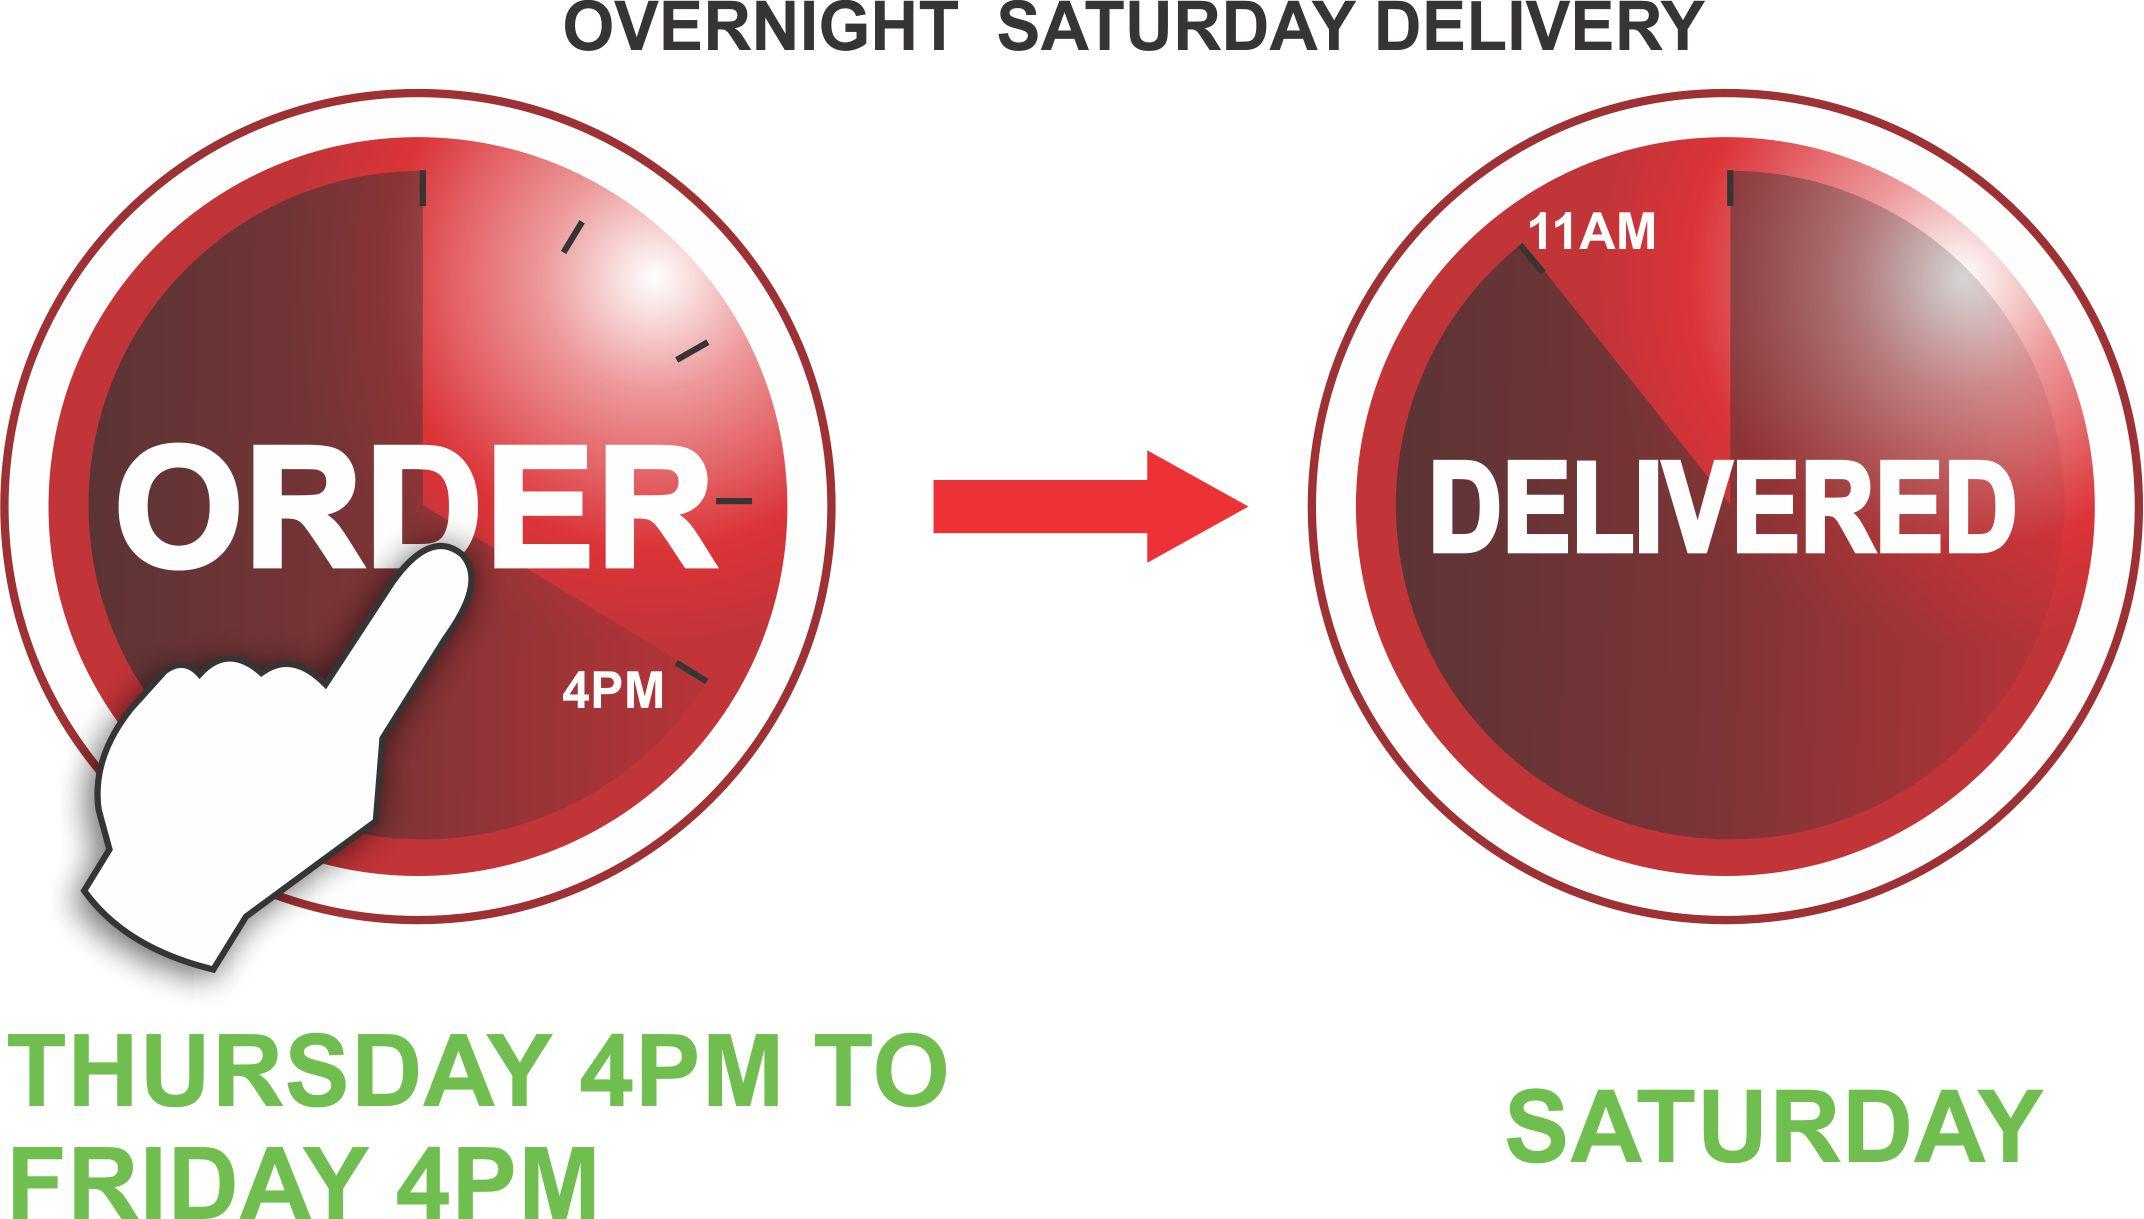 overnight-saturday-delivery